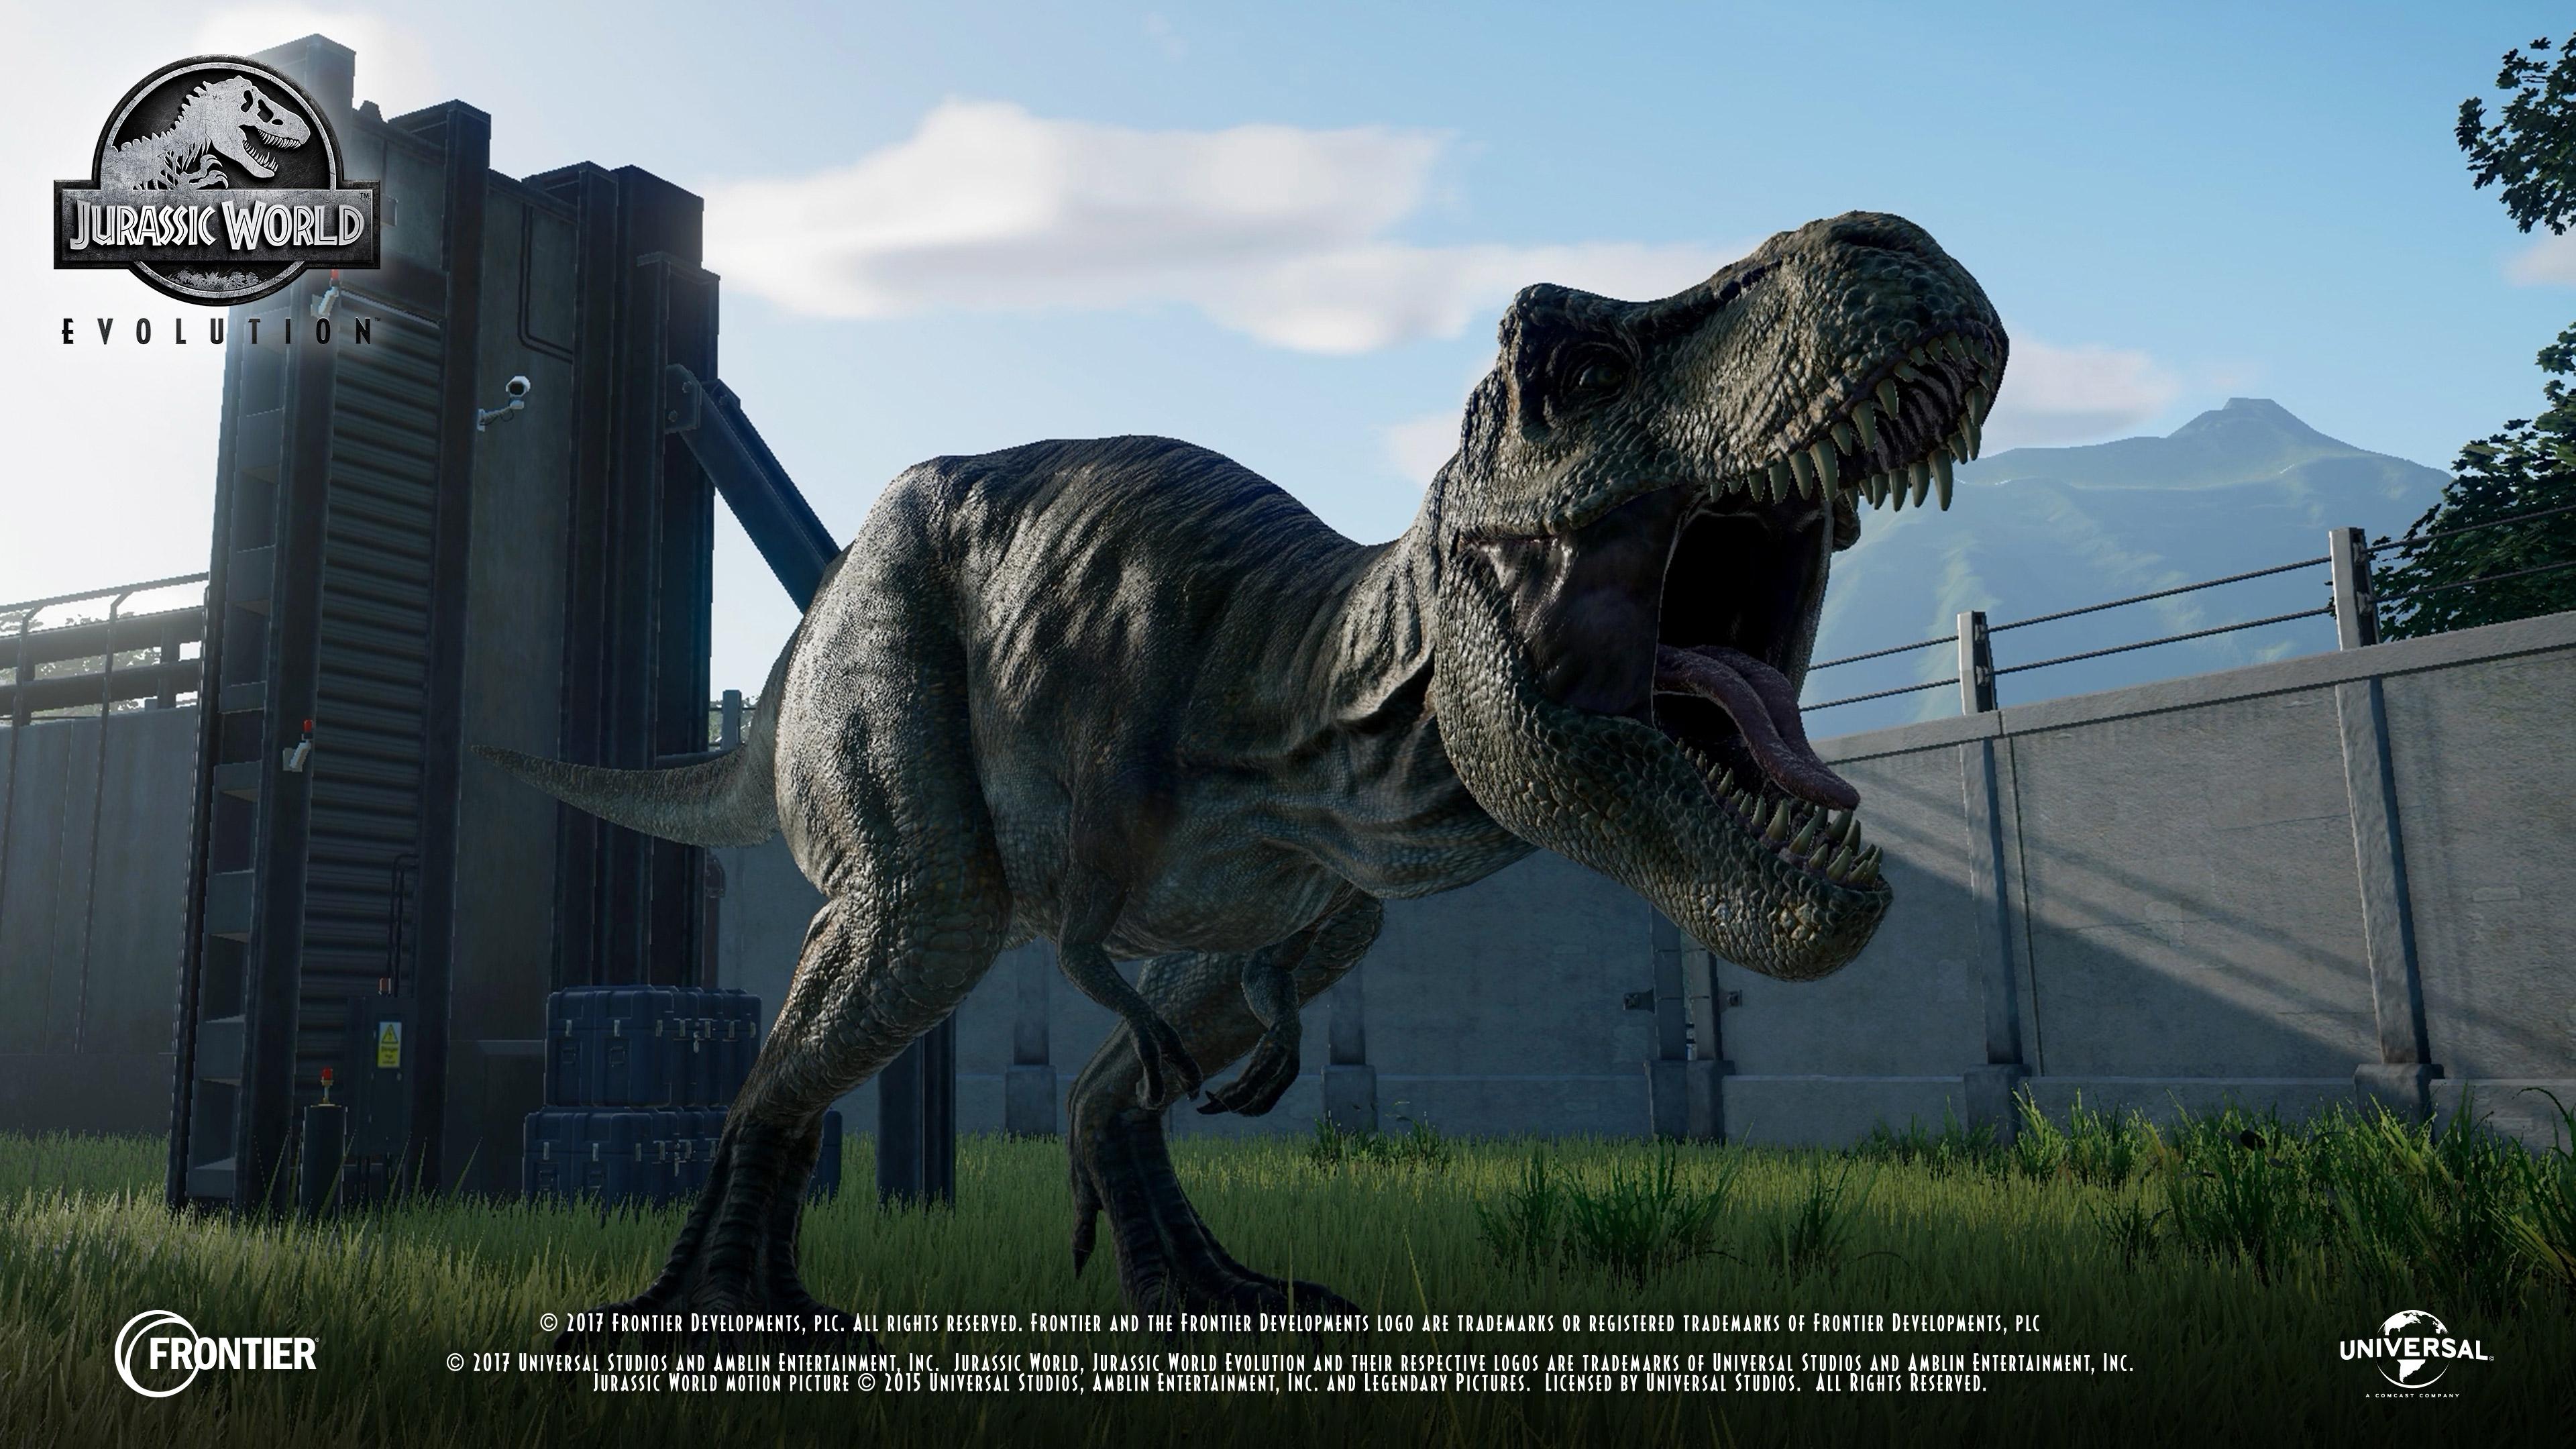 Theme Park Simulation Game Jurassic World Evolution Gets